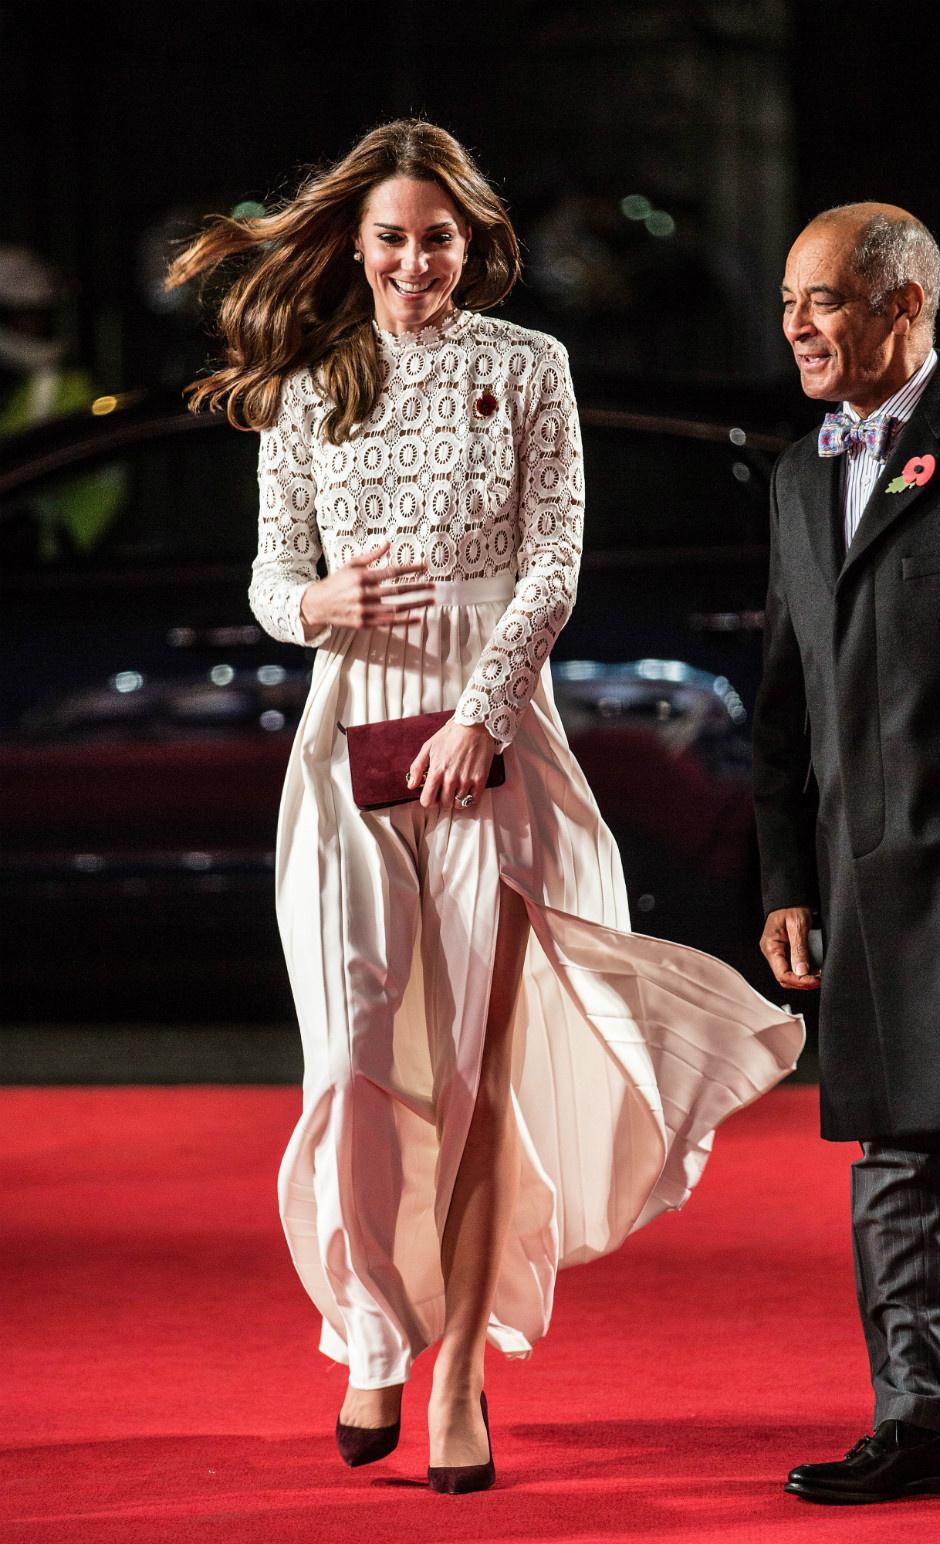 10 раз, когда Кейт Миддлтон пренебрегла королевским дресс-кодом фото [10]